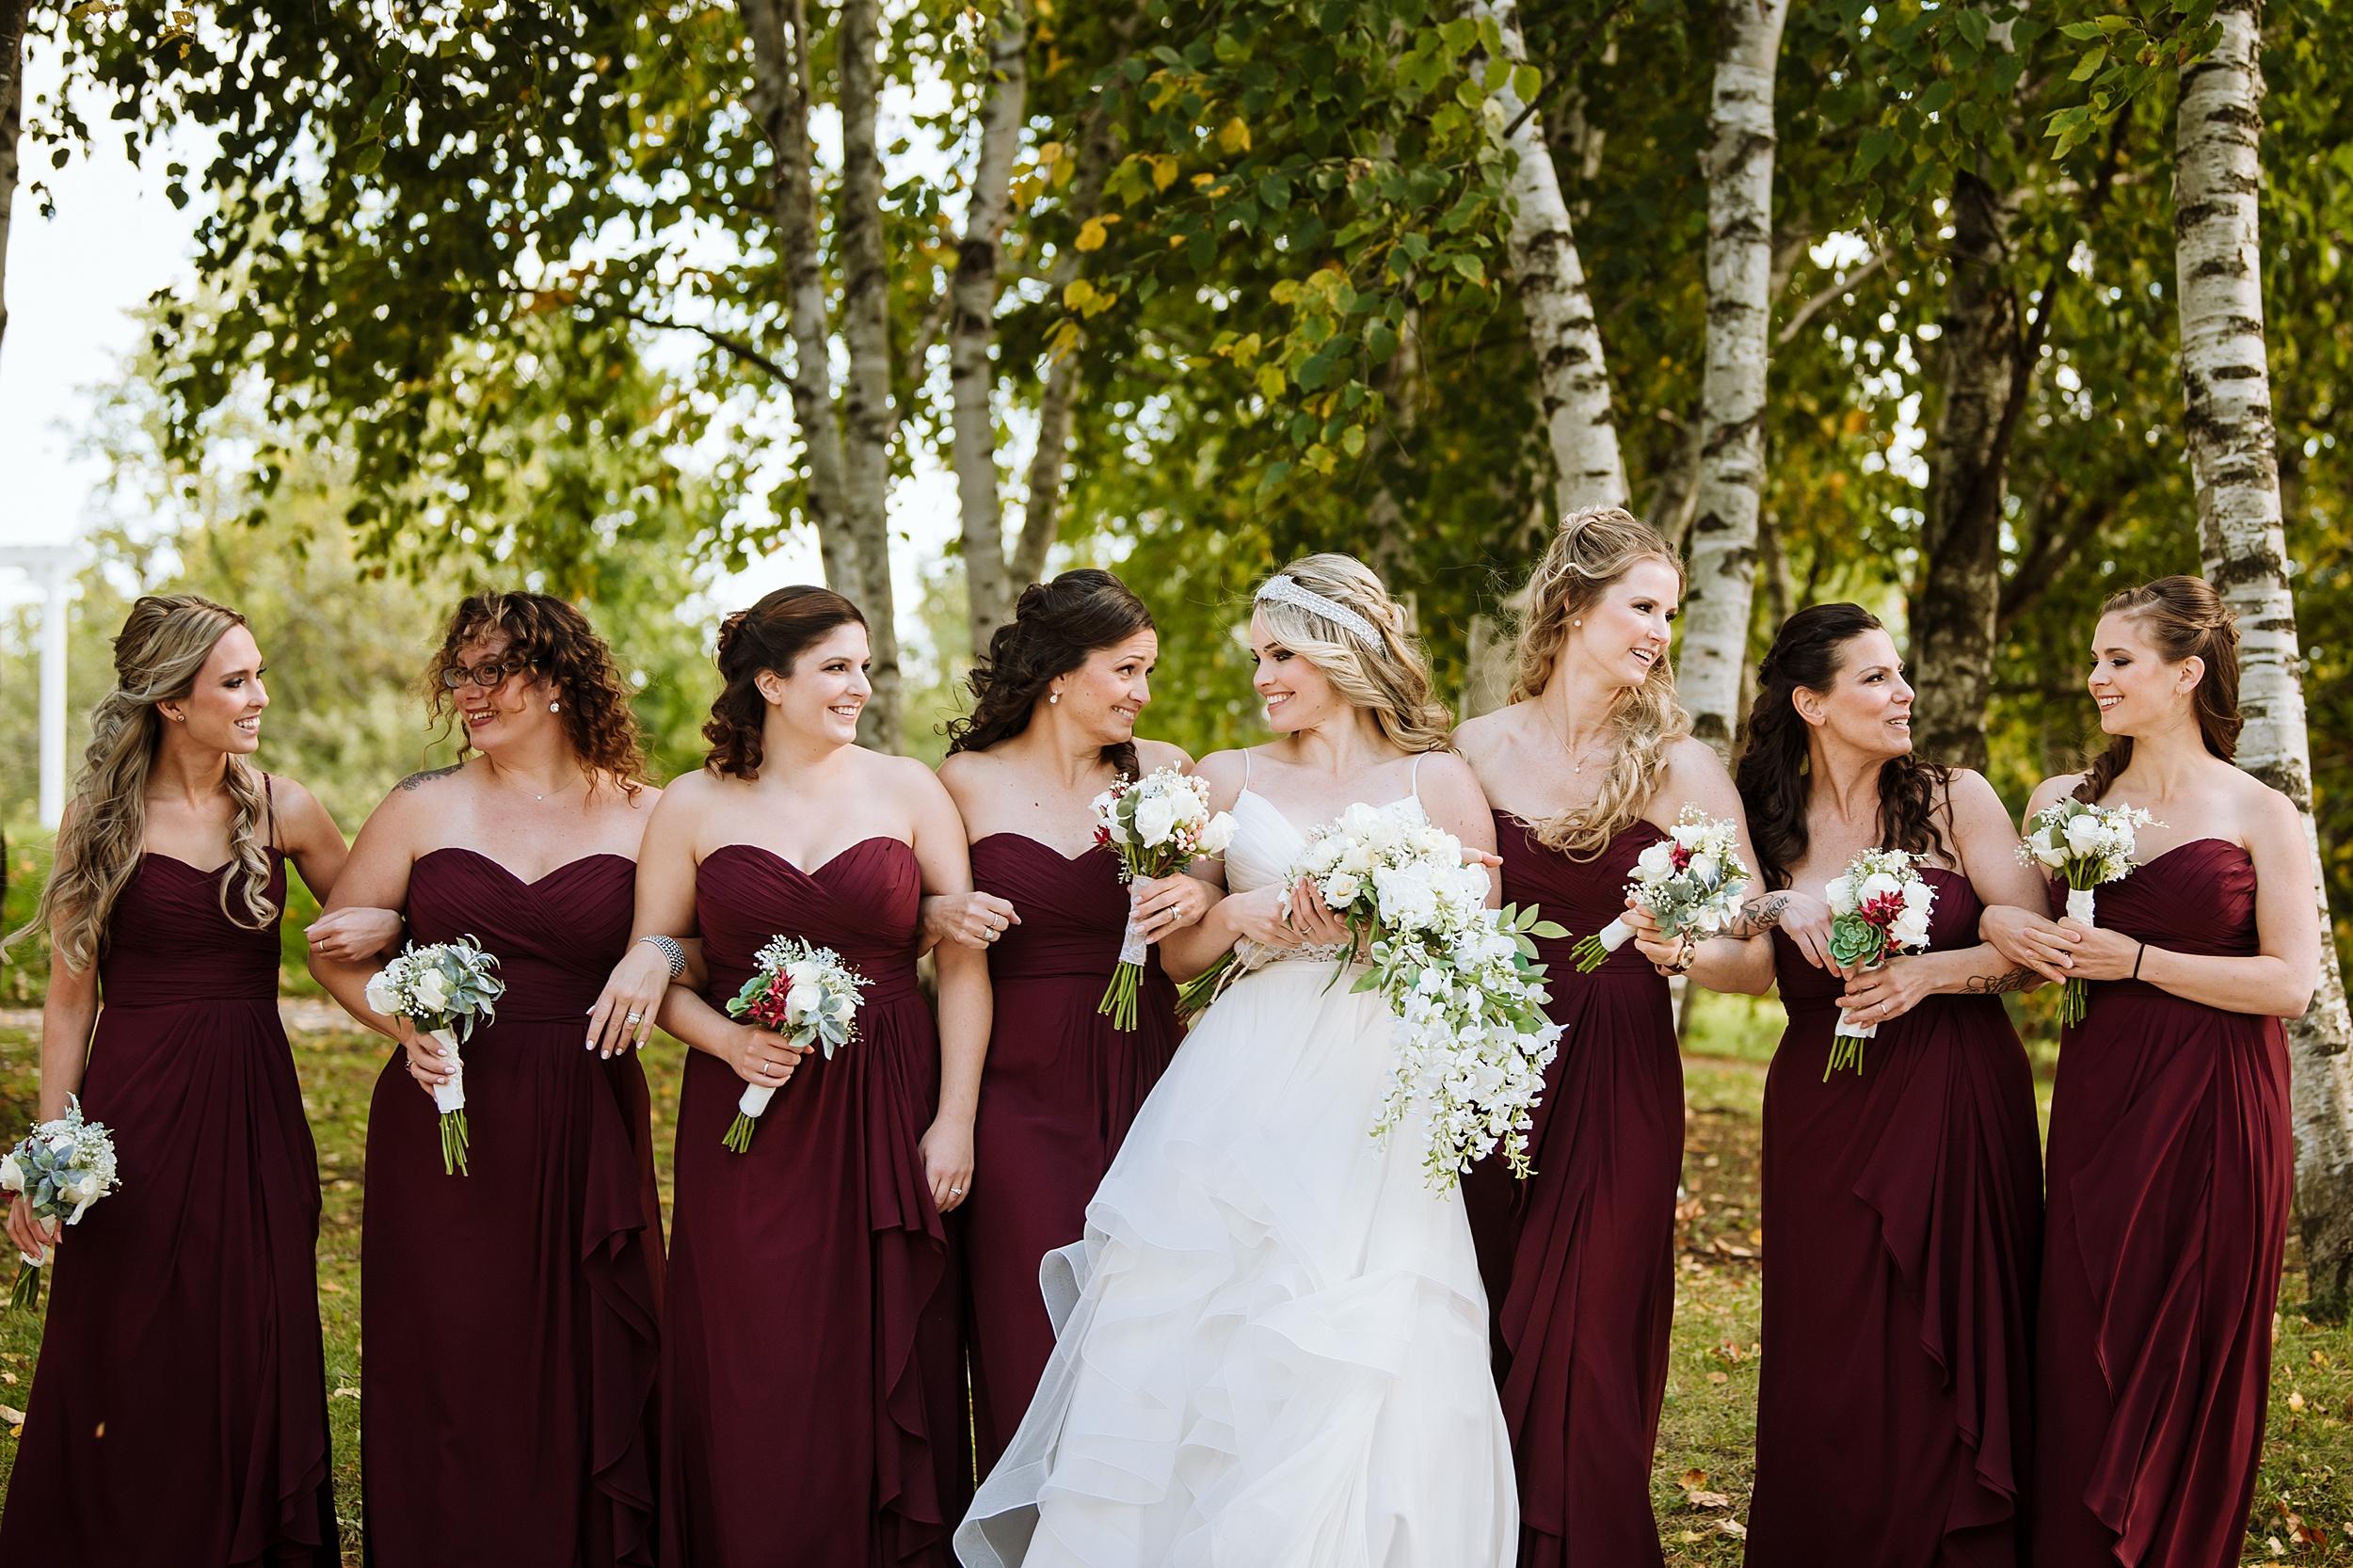 McMichael_Art_Collection_Wedding_chateau_le_jardin_Justine_Munro_Toronto_Photographer034.jpg